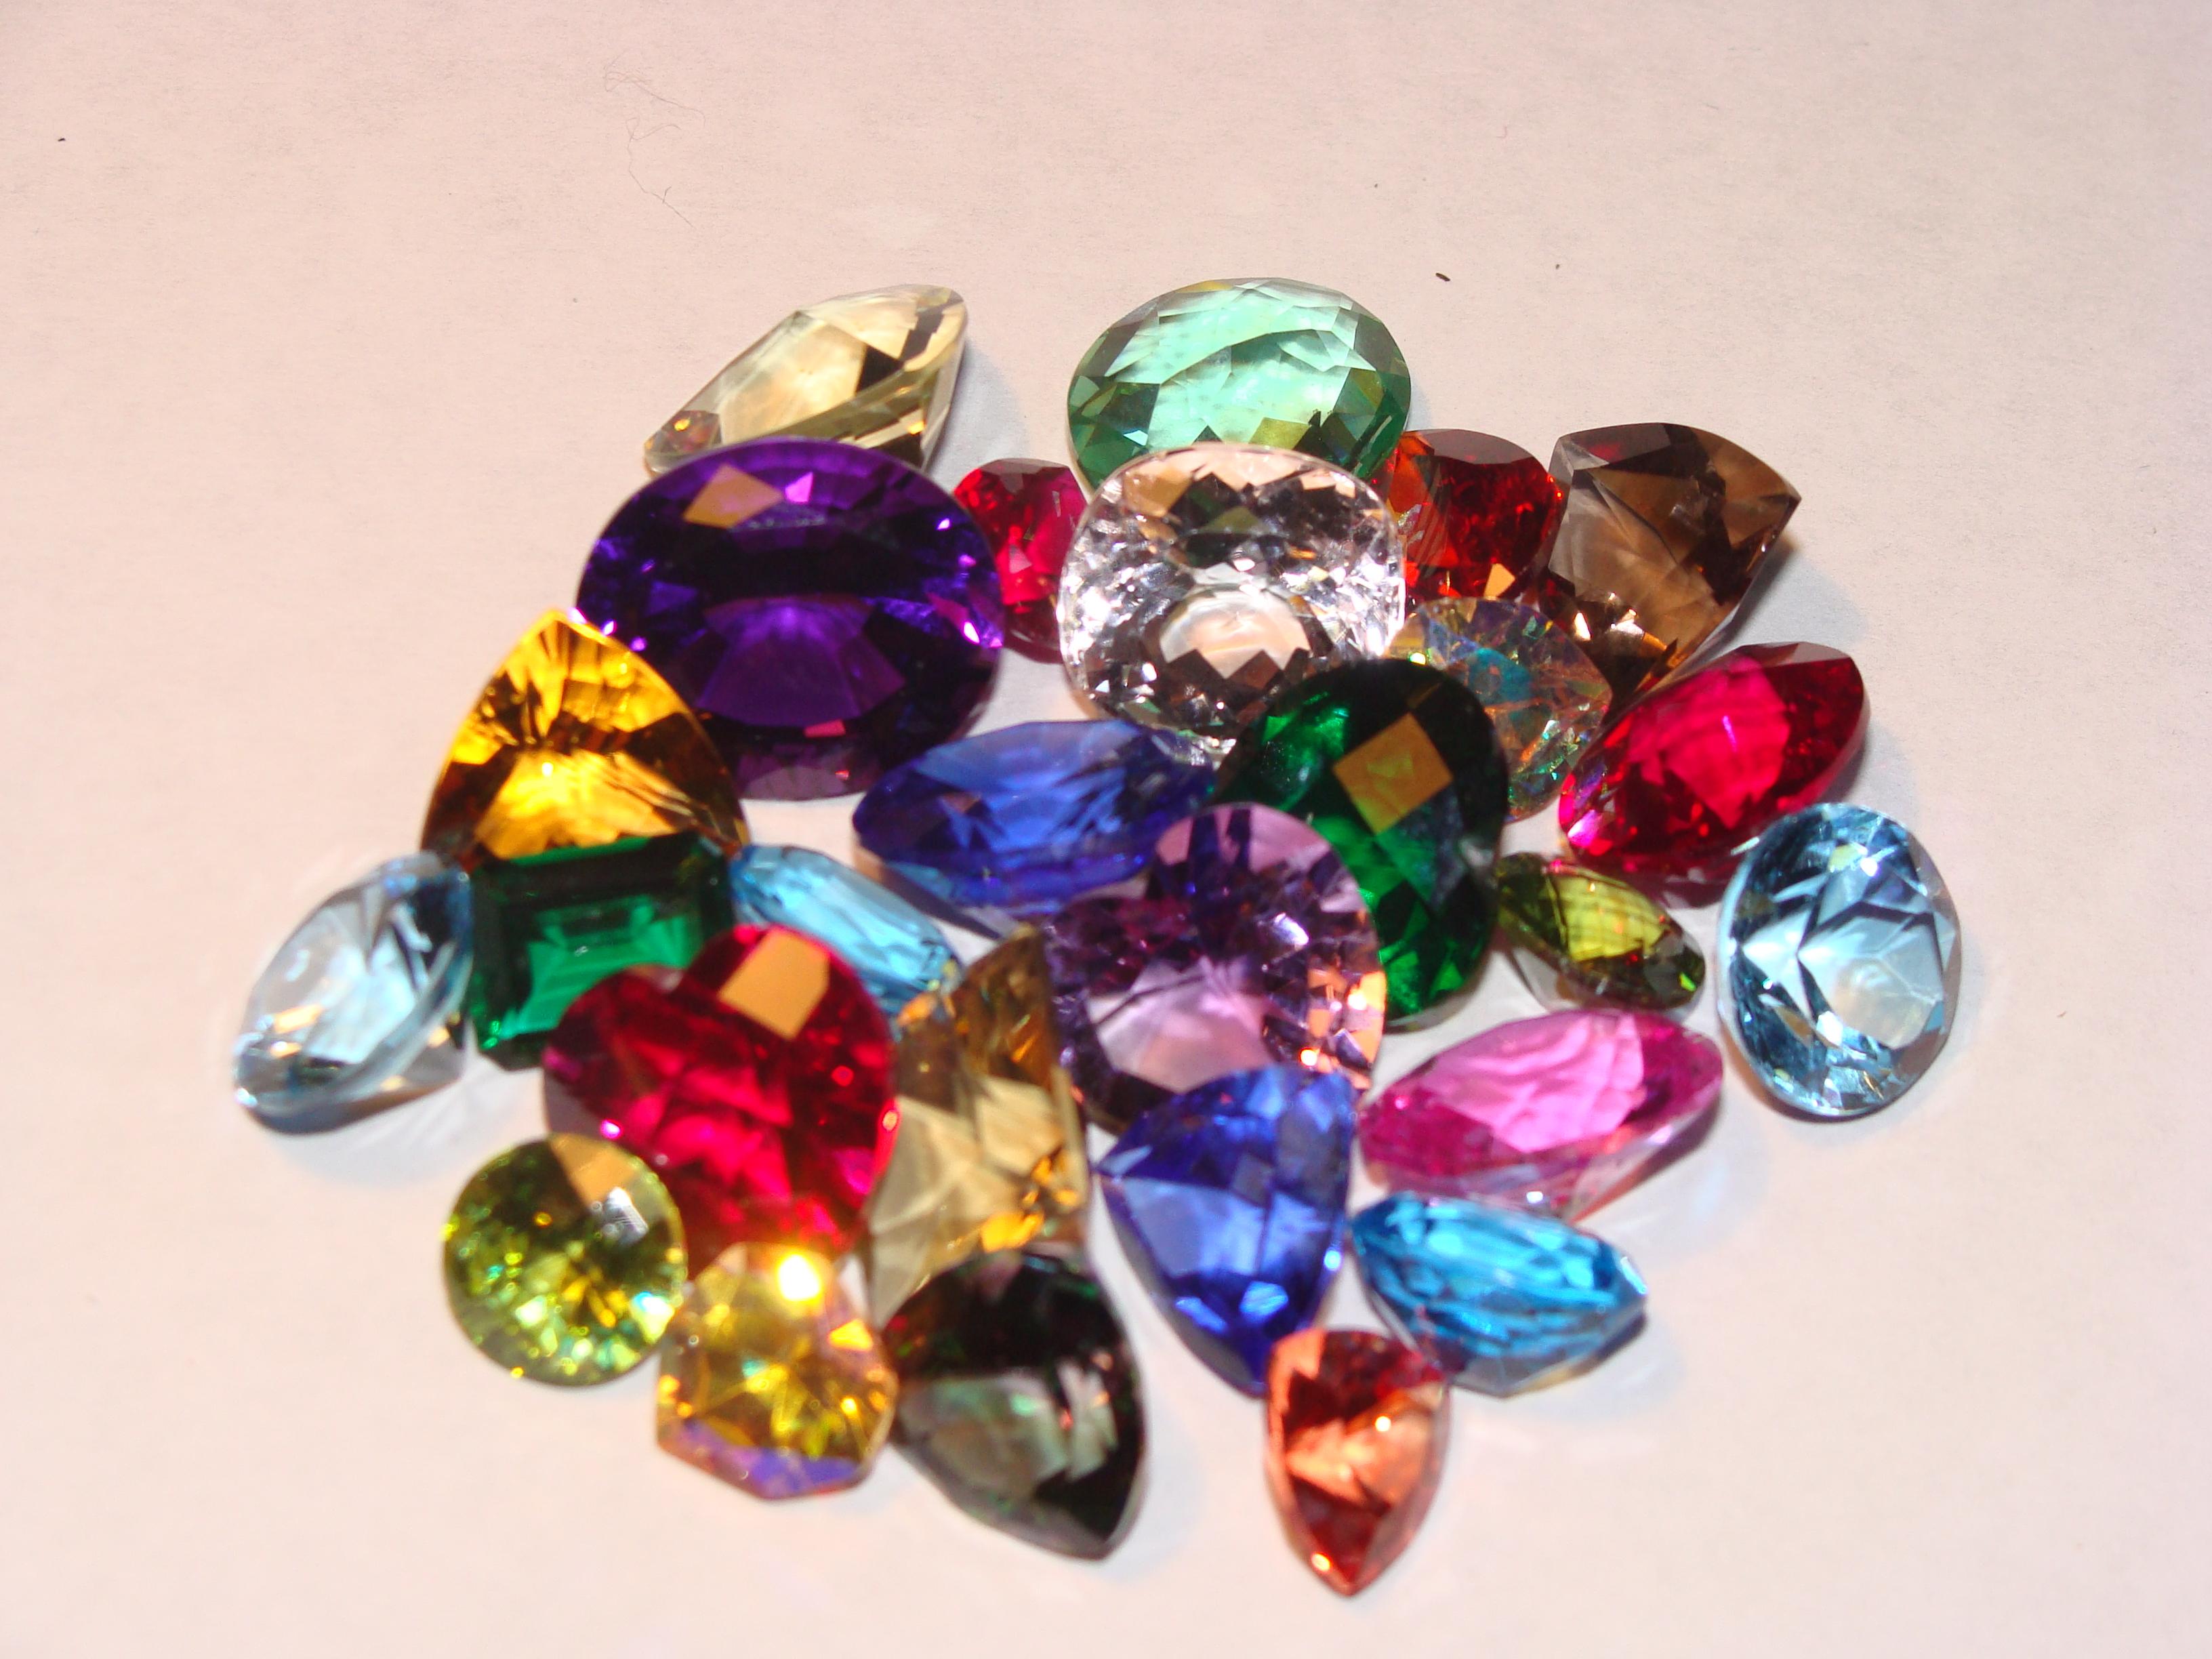 All Natural Gemstones Loose Faceted Gemstones